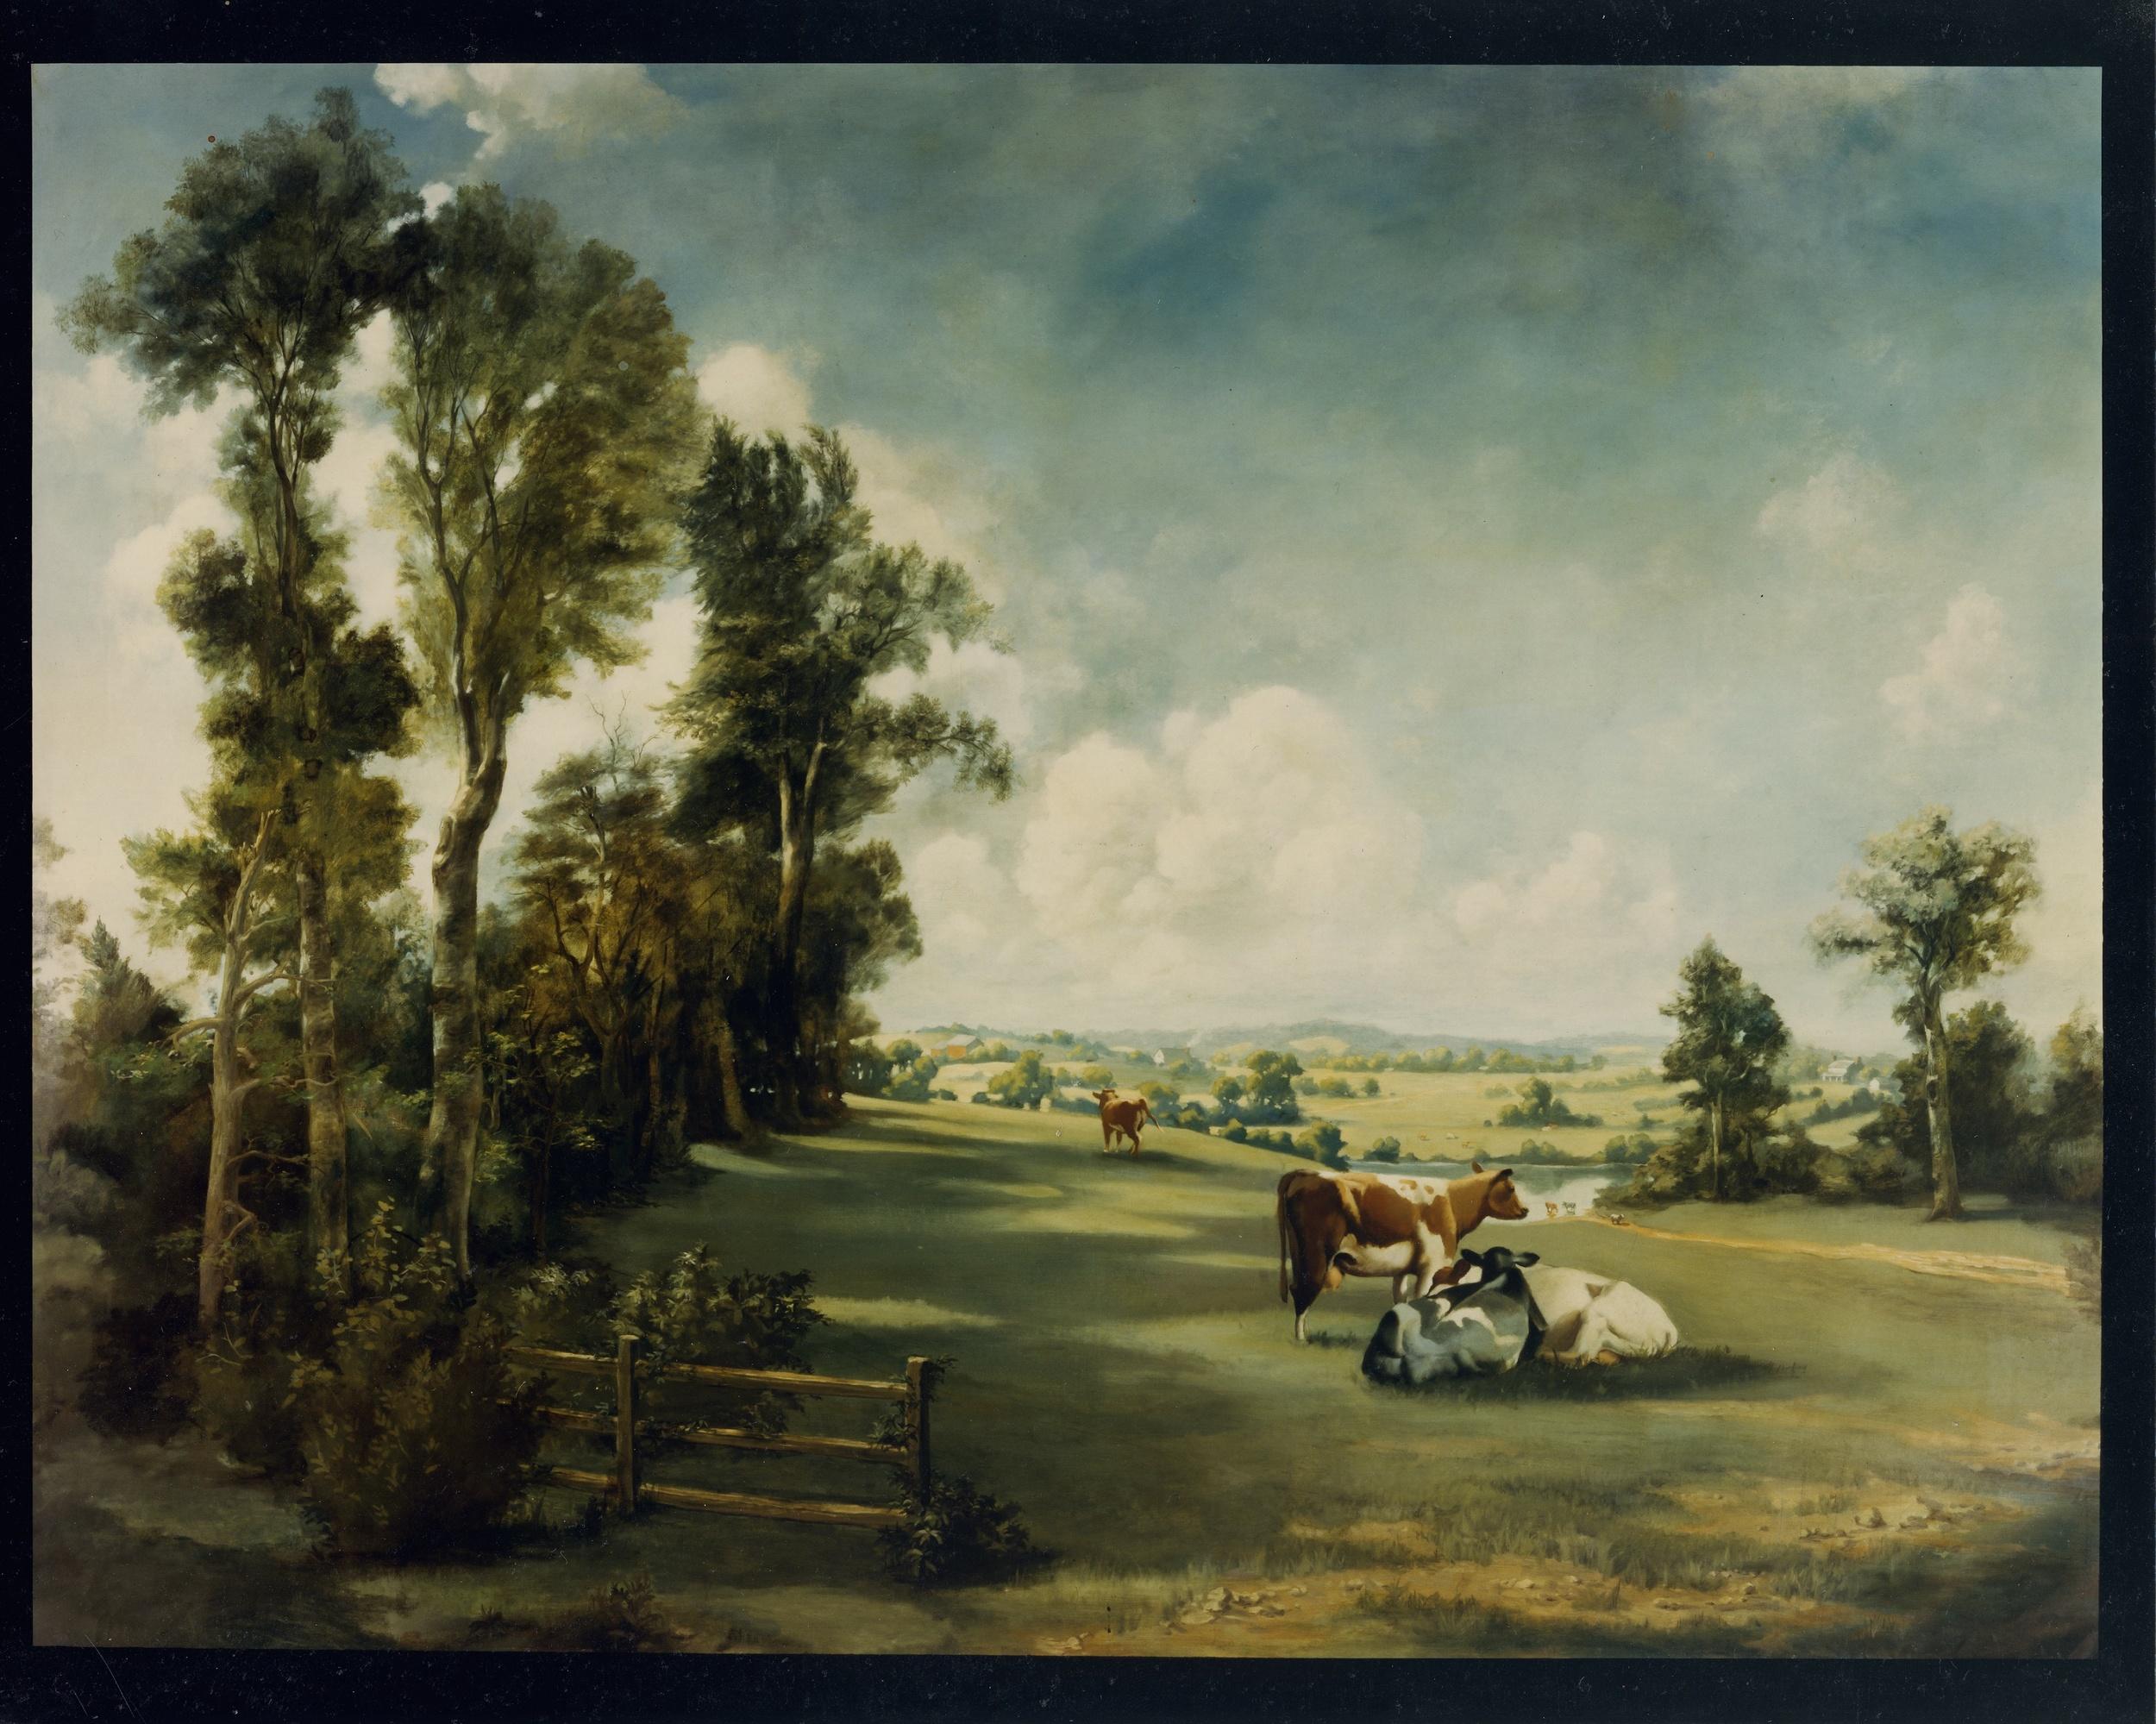 BillyFrancis Landscape3 (1).jpg